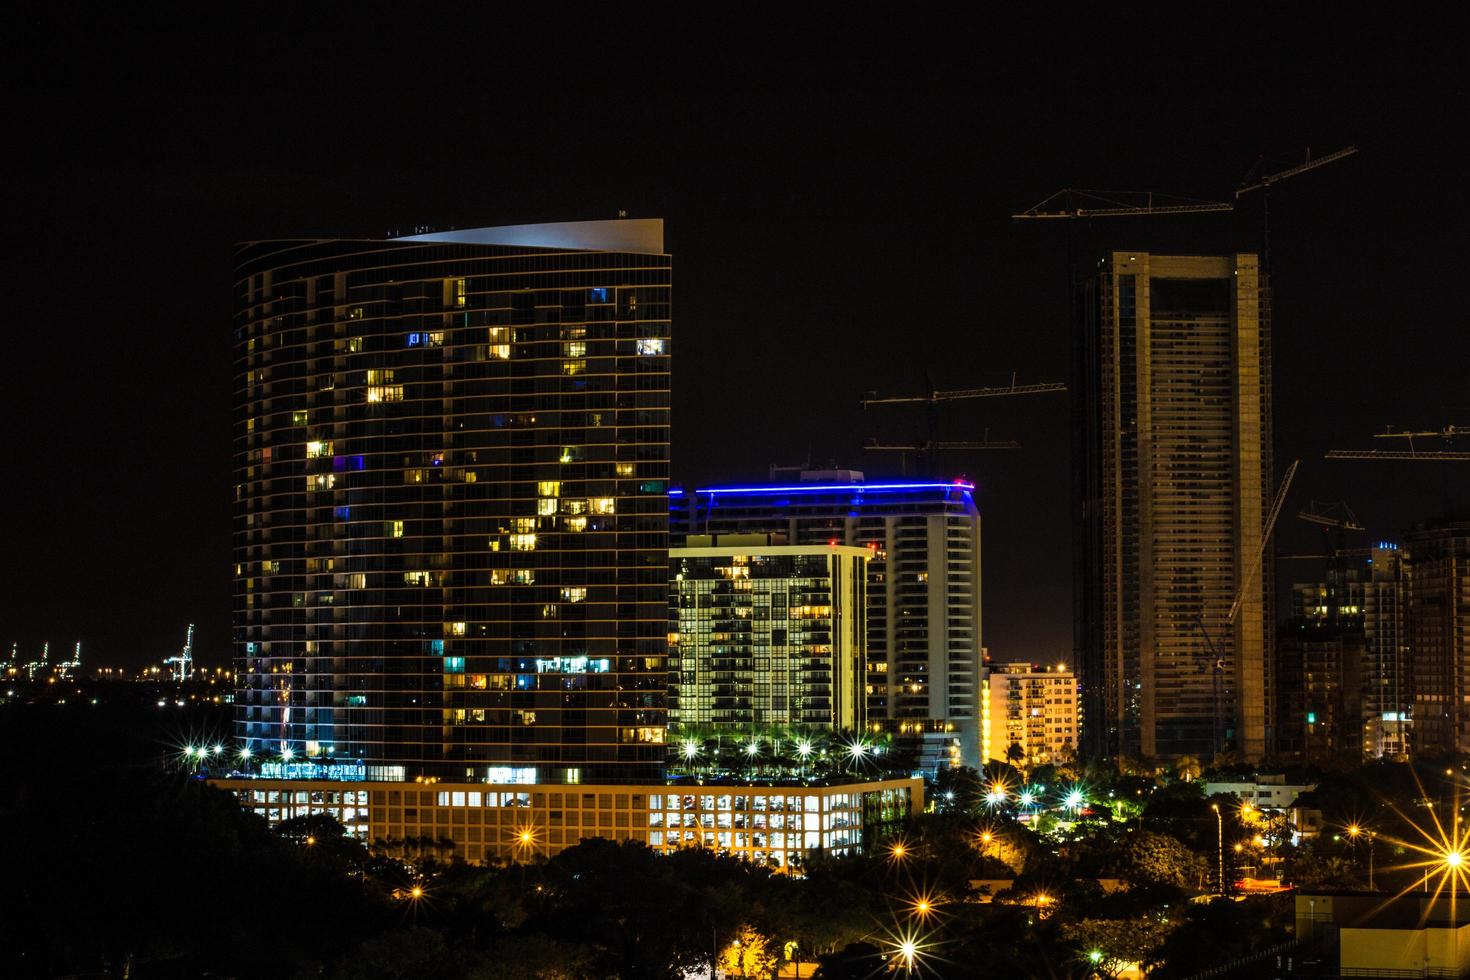 Miami, Florida, 2020 - Cityscape at nighttime photo